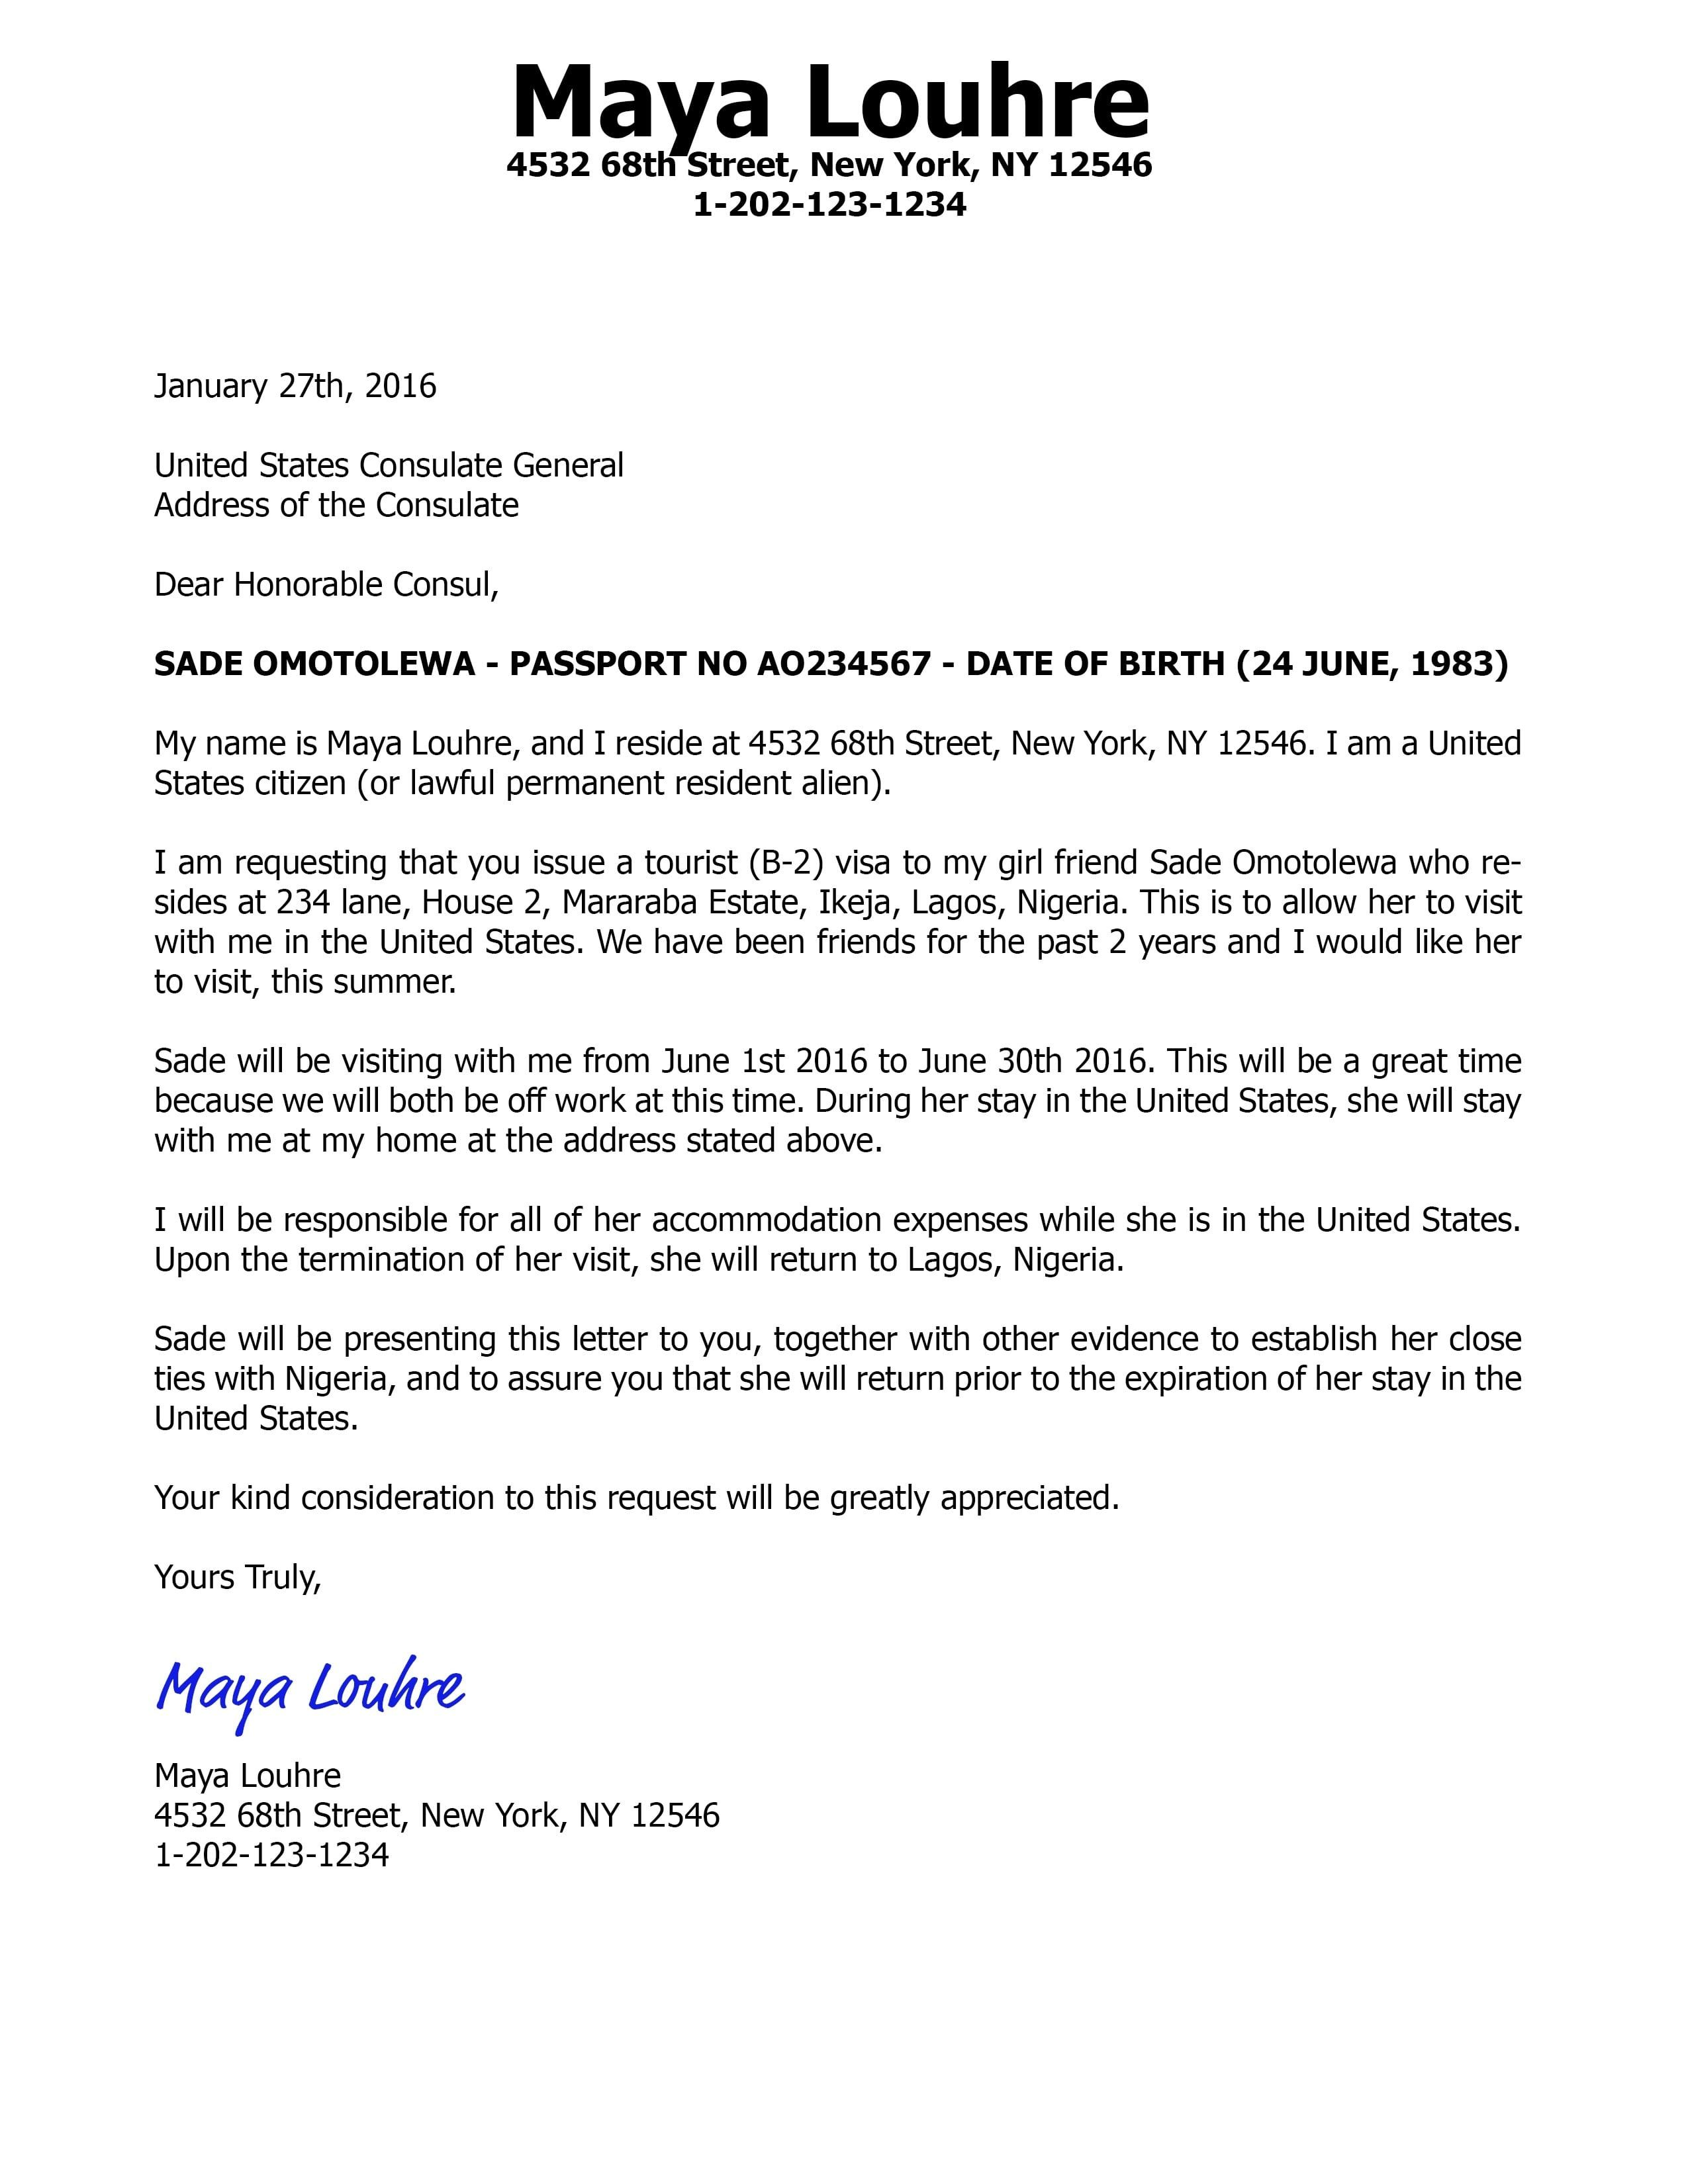 Invitations Letter For Visitor Visa Friend Sample Of Invitation